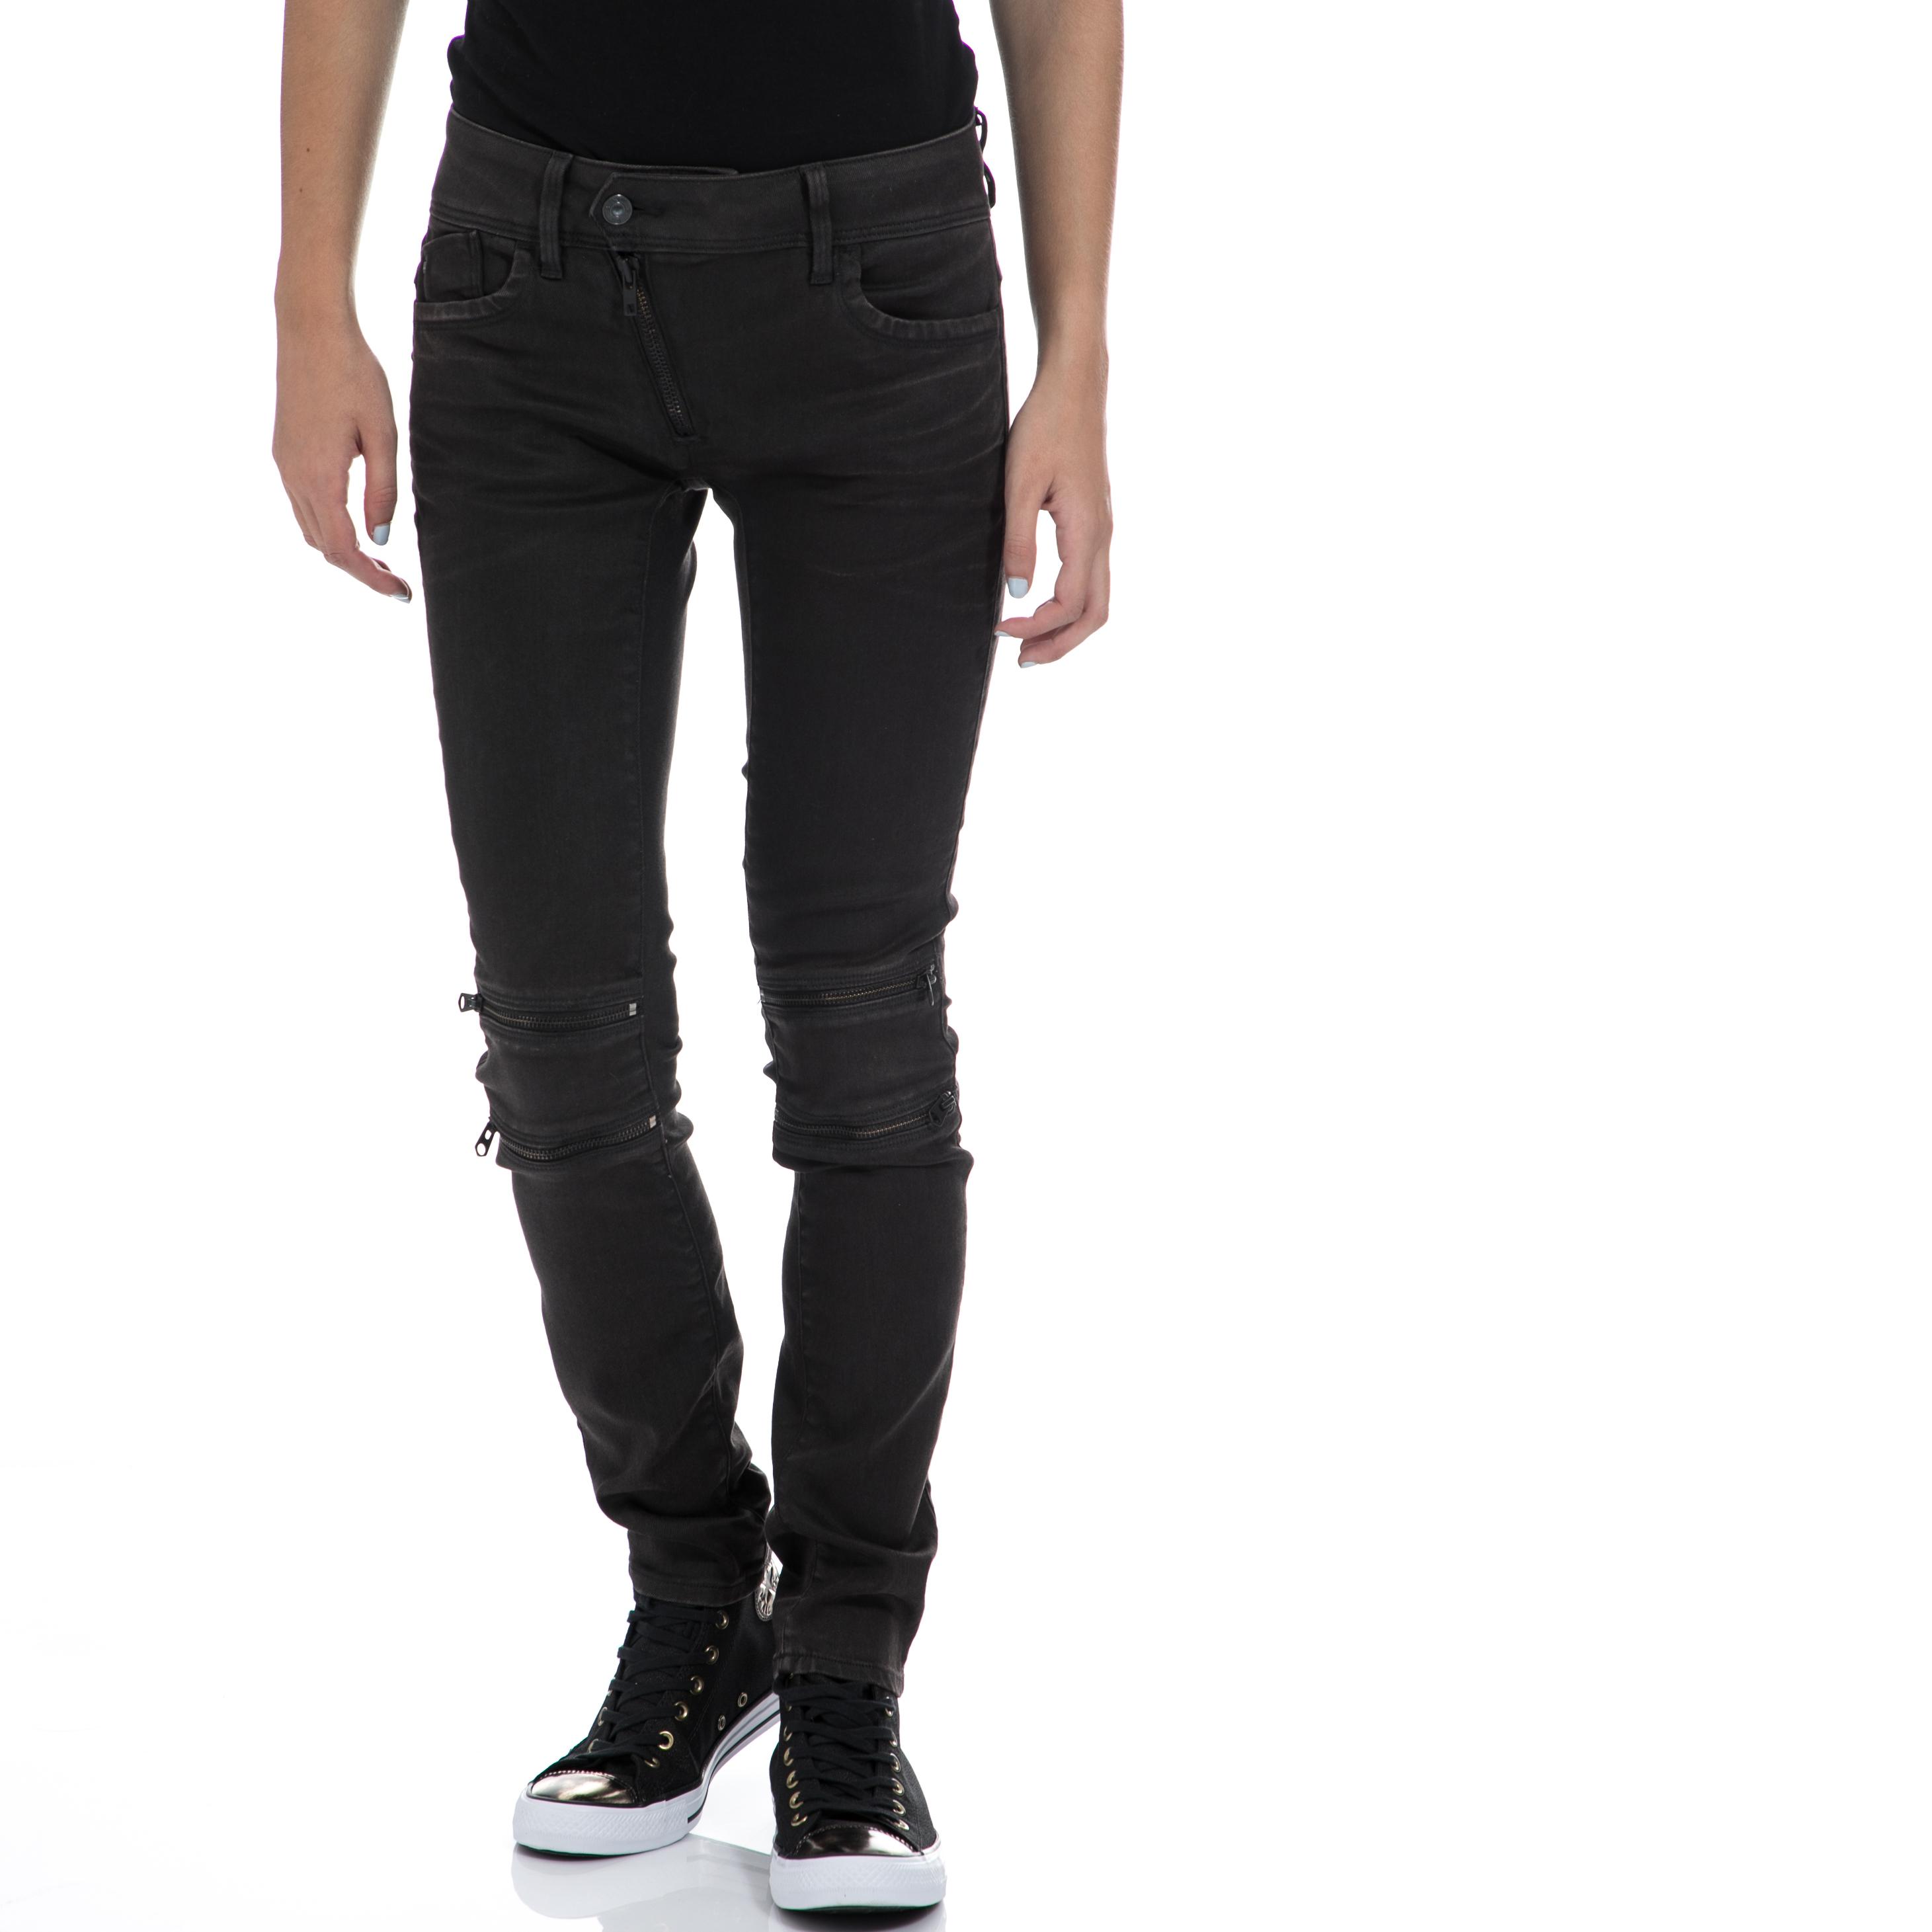 G-STAR RAW - Γυναικείο τζιν παντελόνι G-STAR RAW μαύρο γυναικεία ρούχα παντελόνια jean